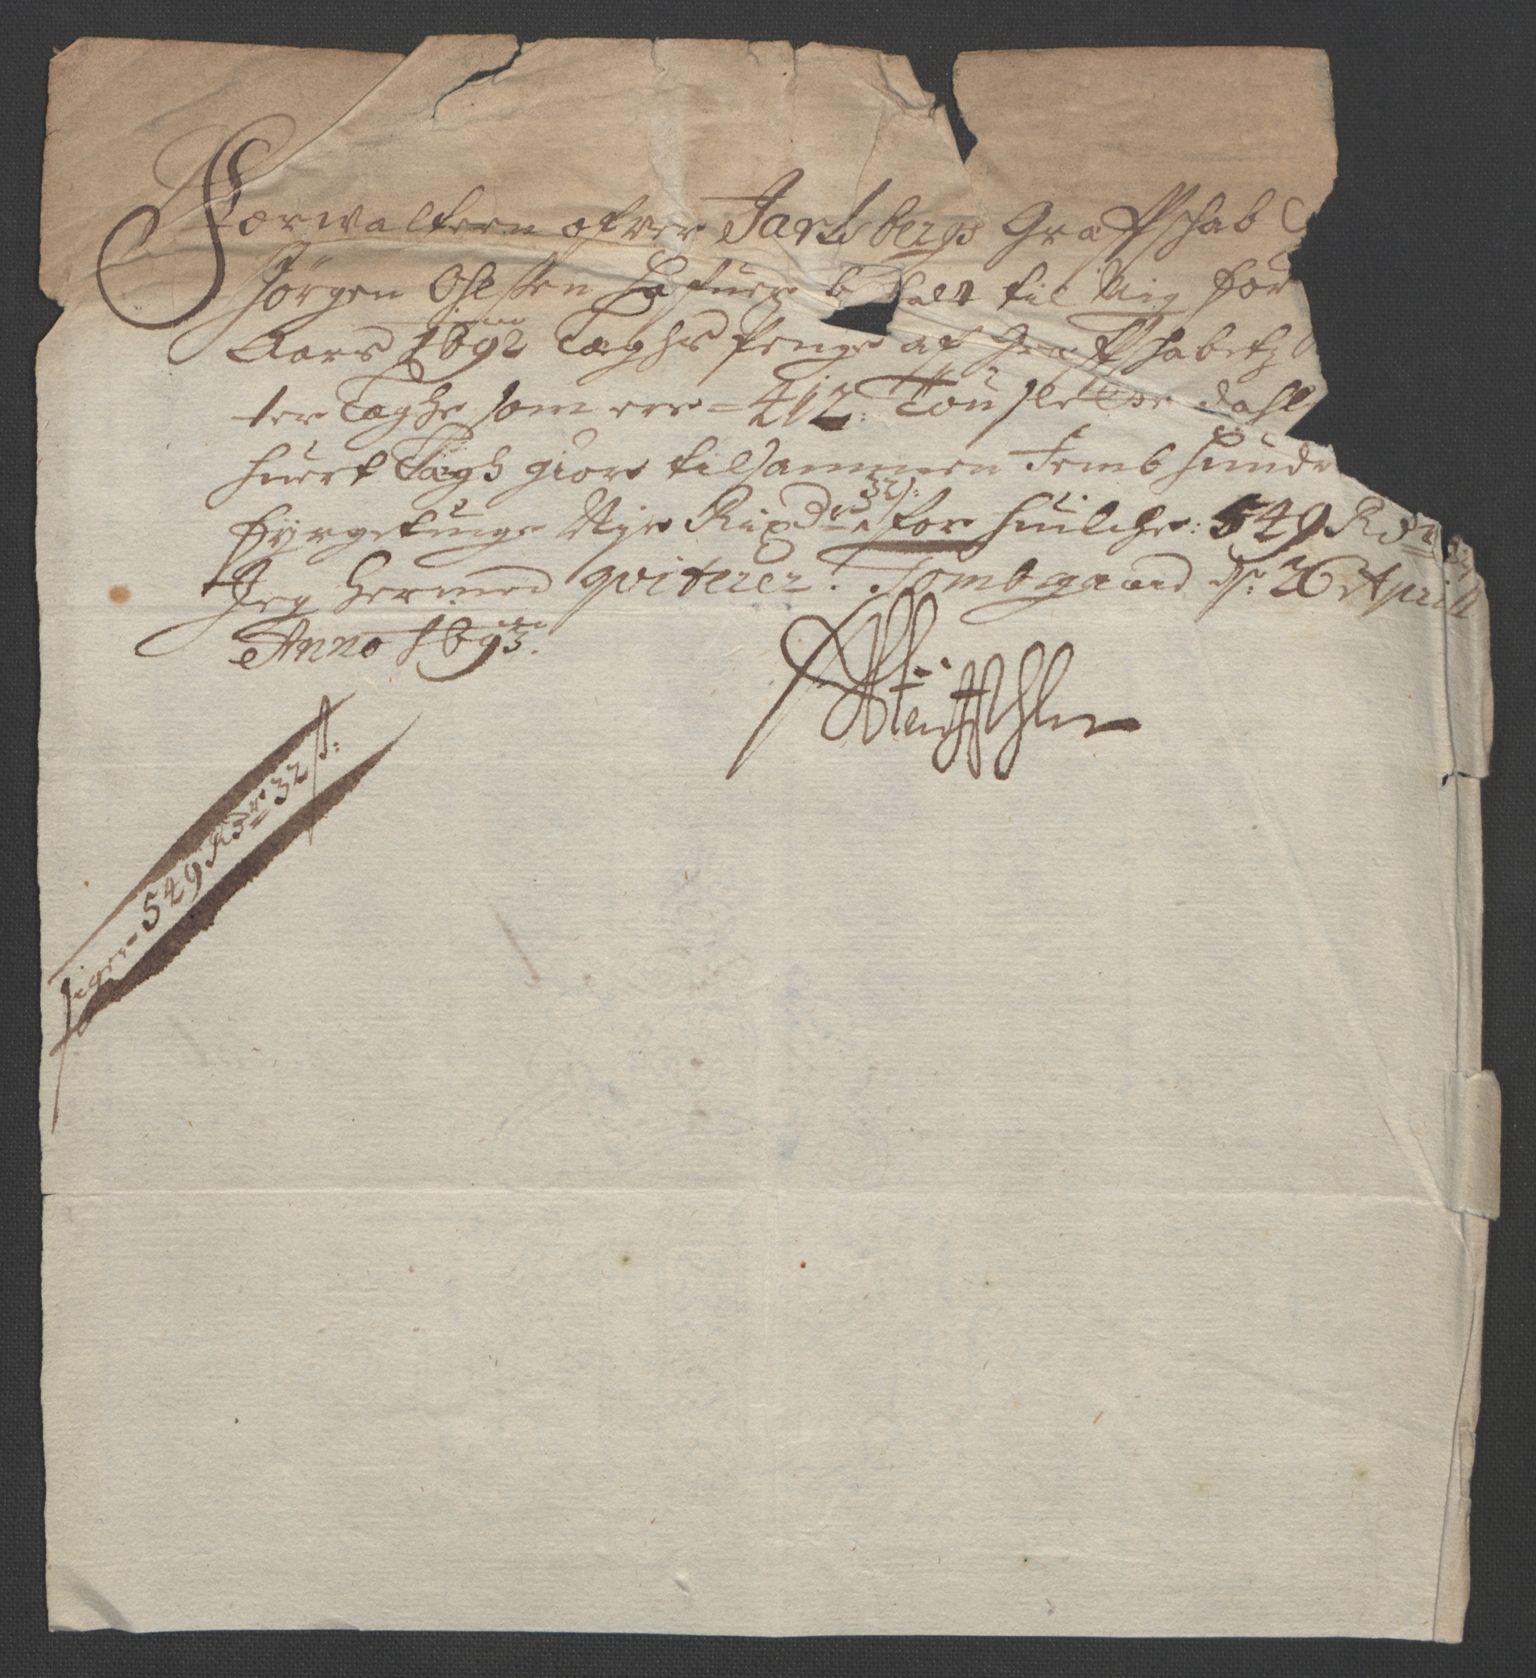 RA, Rentekammeret inntil 1814, Reviderte regnskaper, Fogderegnskap, R32/L1865: Fogderegnskap Jarlsberg grevskap, 1692, s. 418